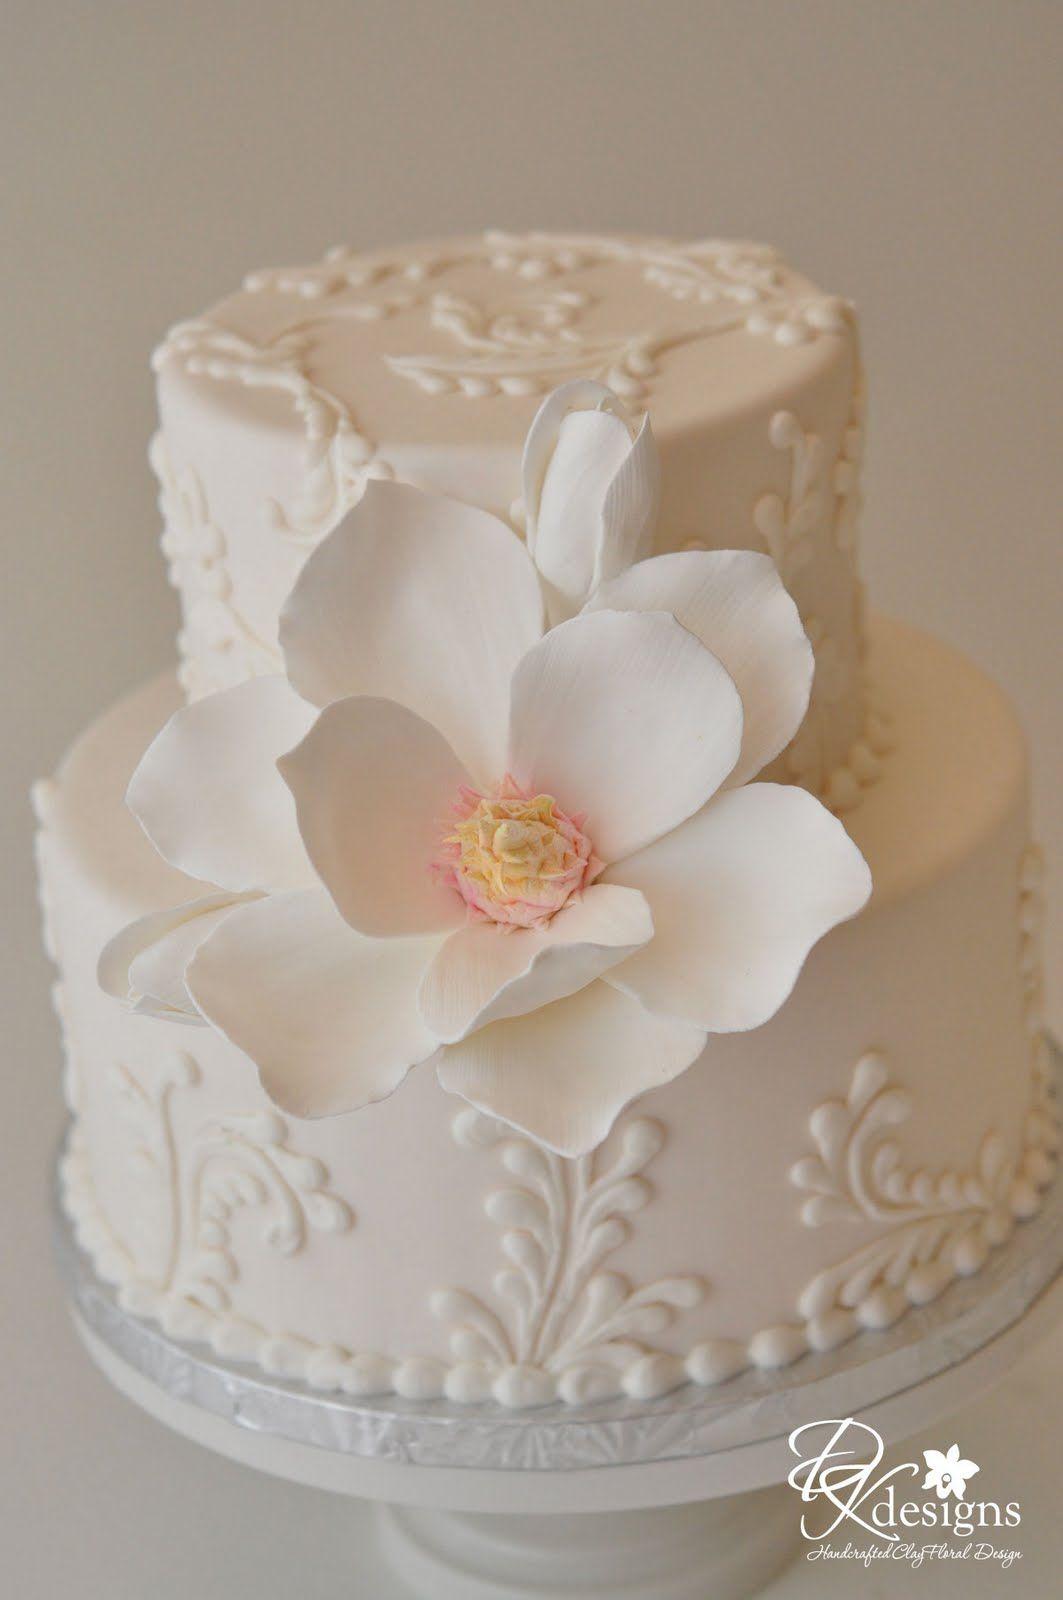 Magnolia Wedding Desserts Pinterest Magnolia Cake And